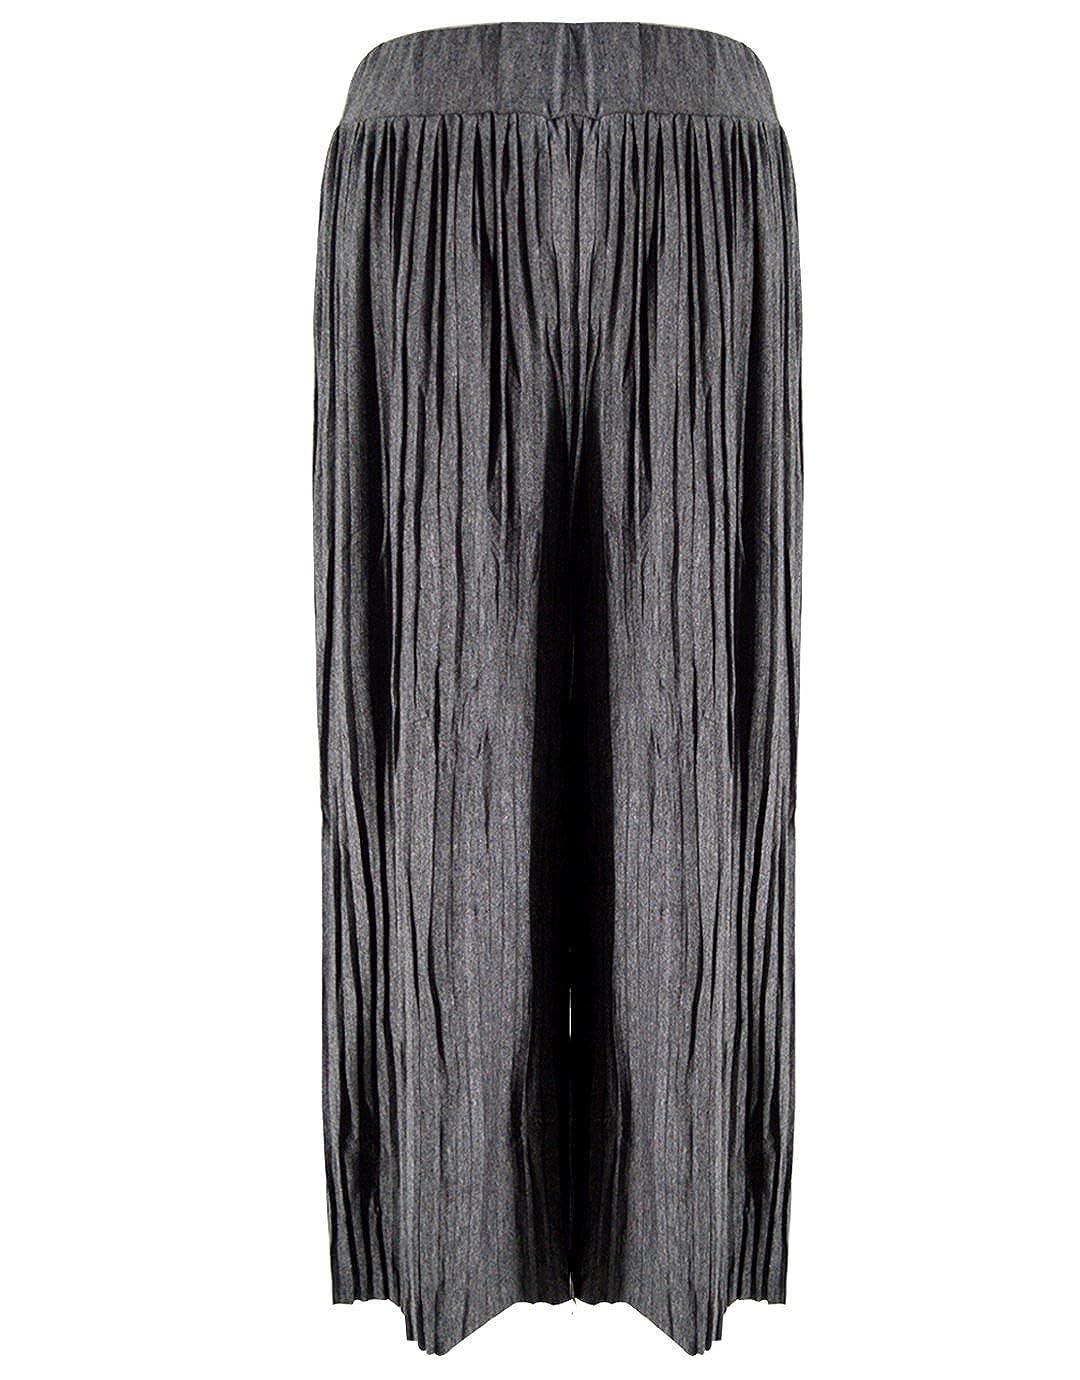 8a36532f7f3 LA HAUTE Women Wide Leg Pants Autumn Winter Cotton Elastic Waist Plus Size  Pleated Trousers Casual Flared Palazzo Trousers  Amazon.co.uk  Clothing